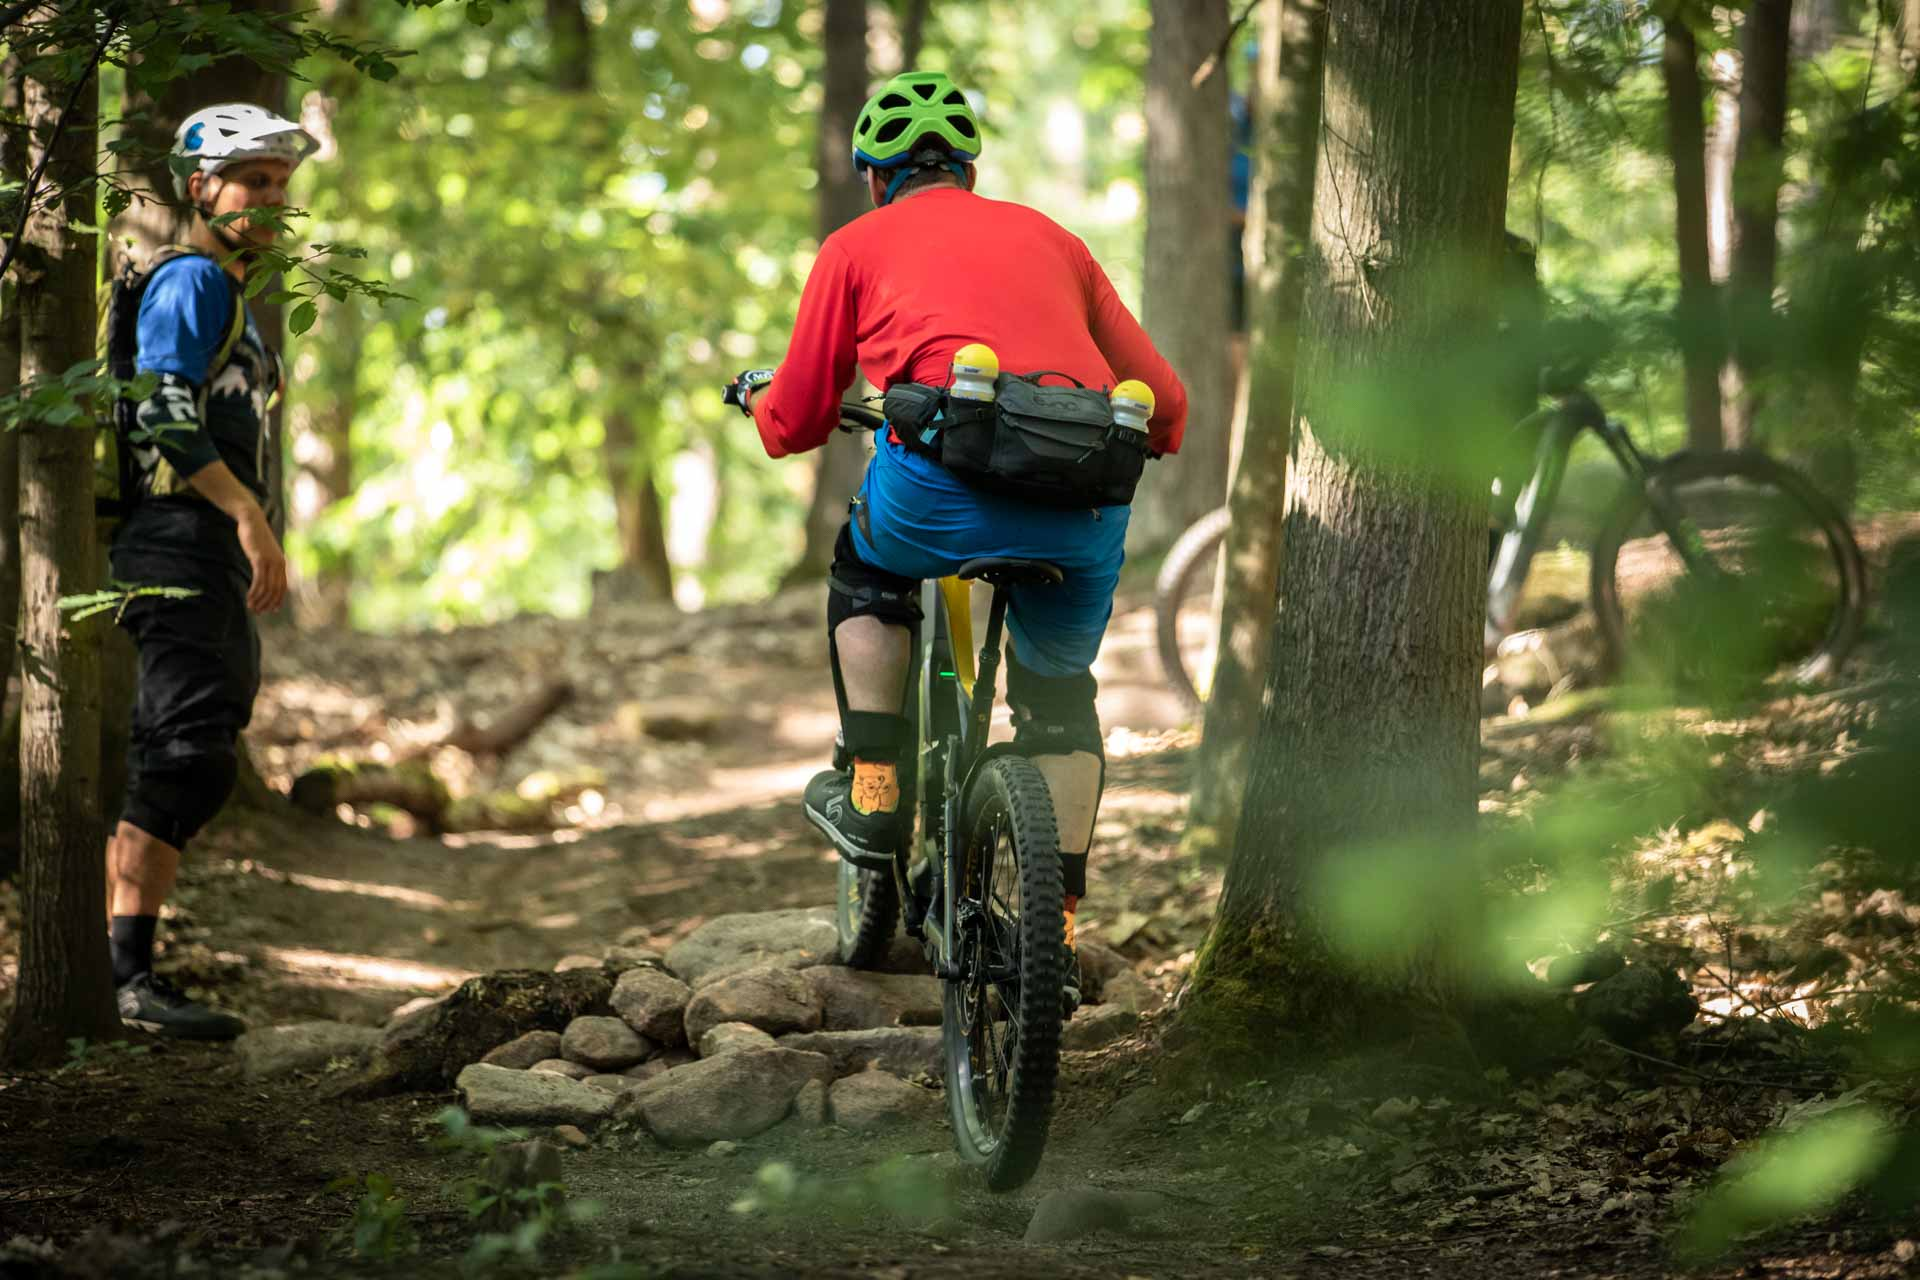 eMTB eBike Fortgeschritten Fahrtechnik Kurs in Siegen - Rock my Trail Bikeschule324